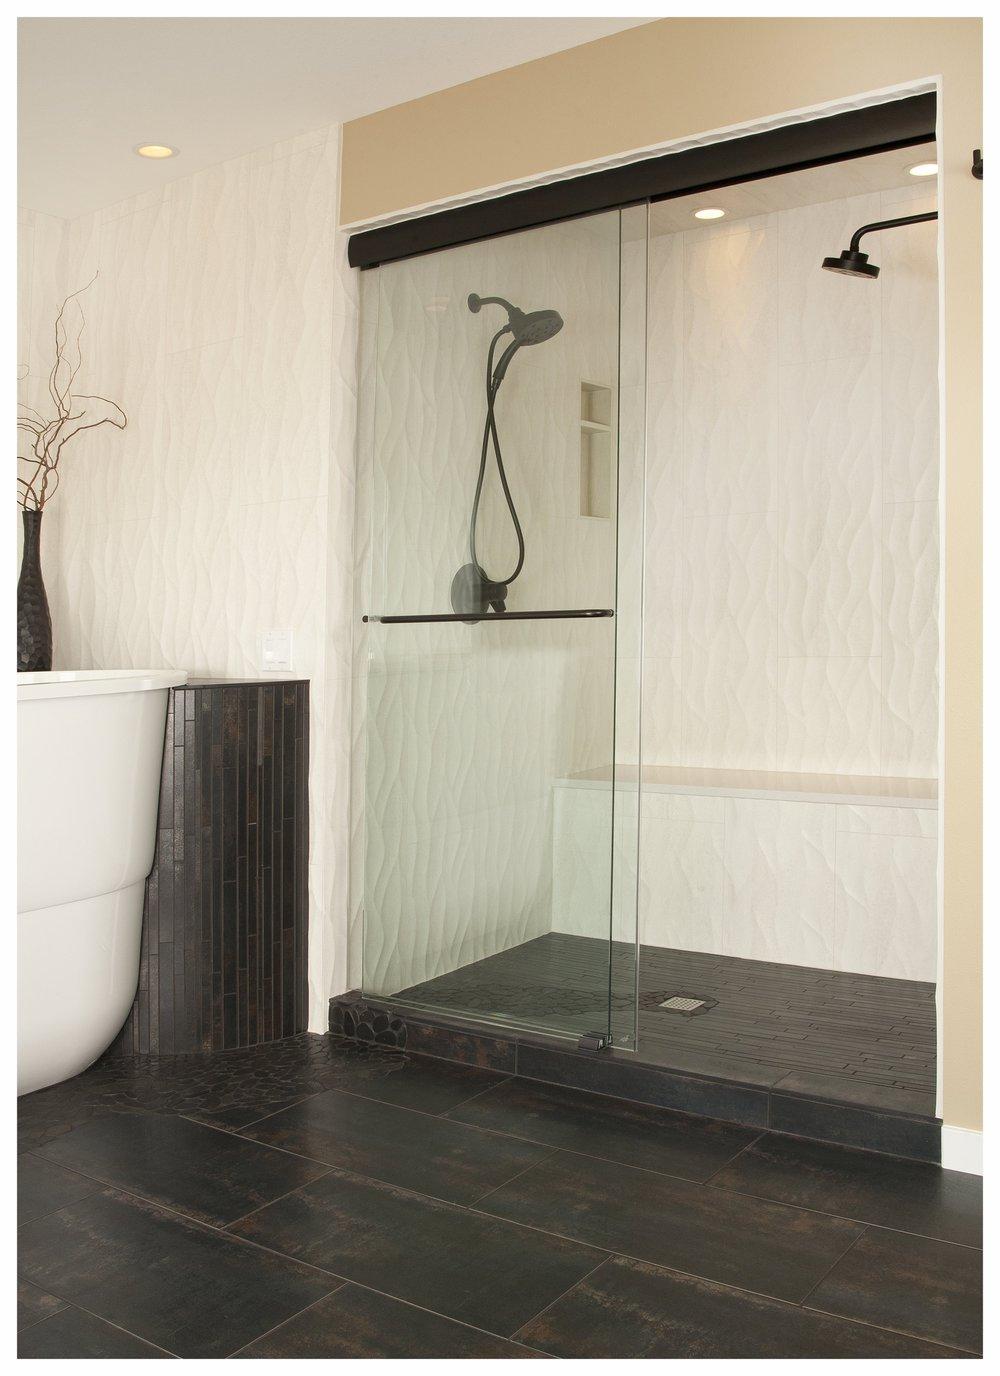 Kirkland Contemporary Master Bath 8.jpg